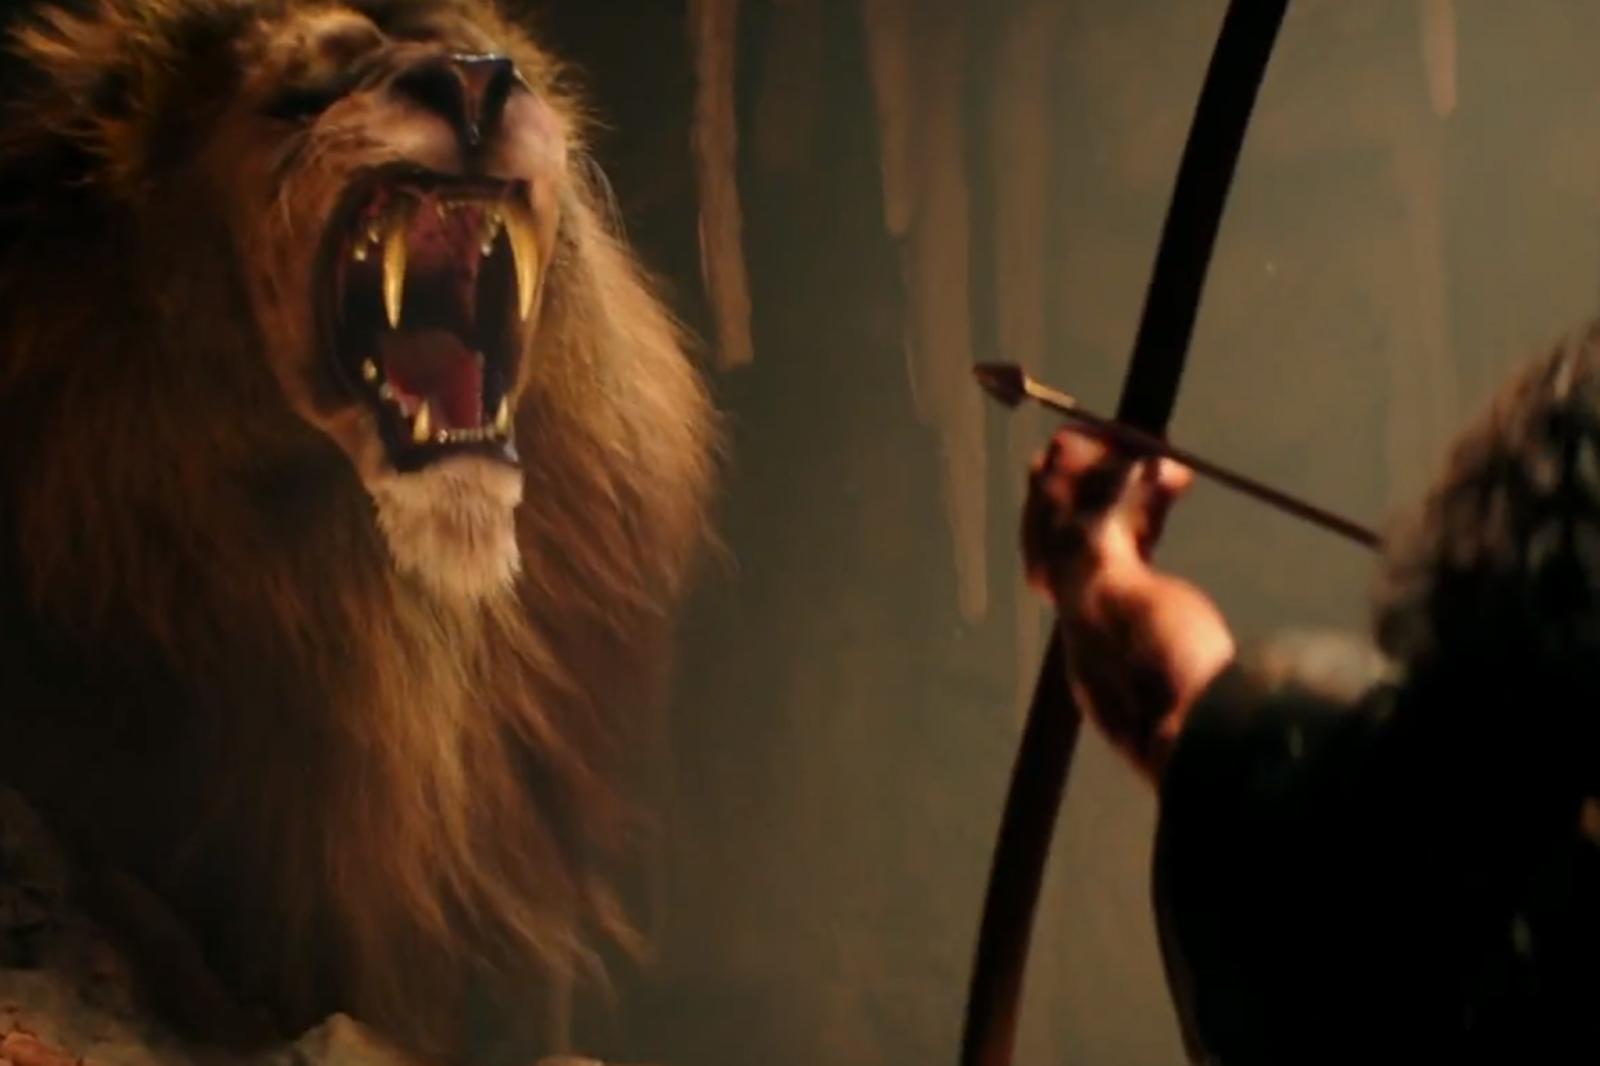 hercules vs nemean lion - HD1600×1066